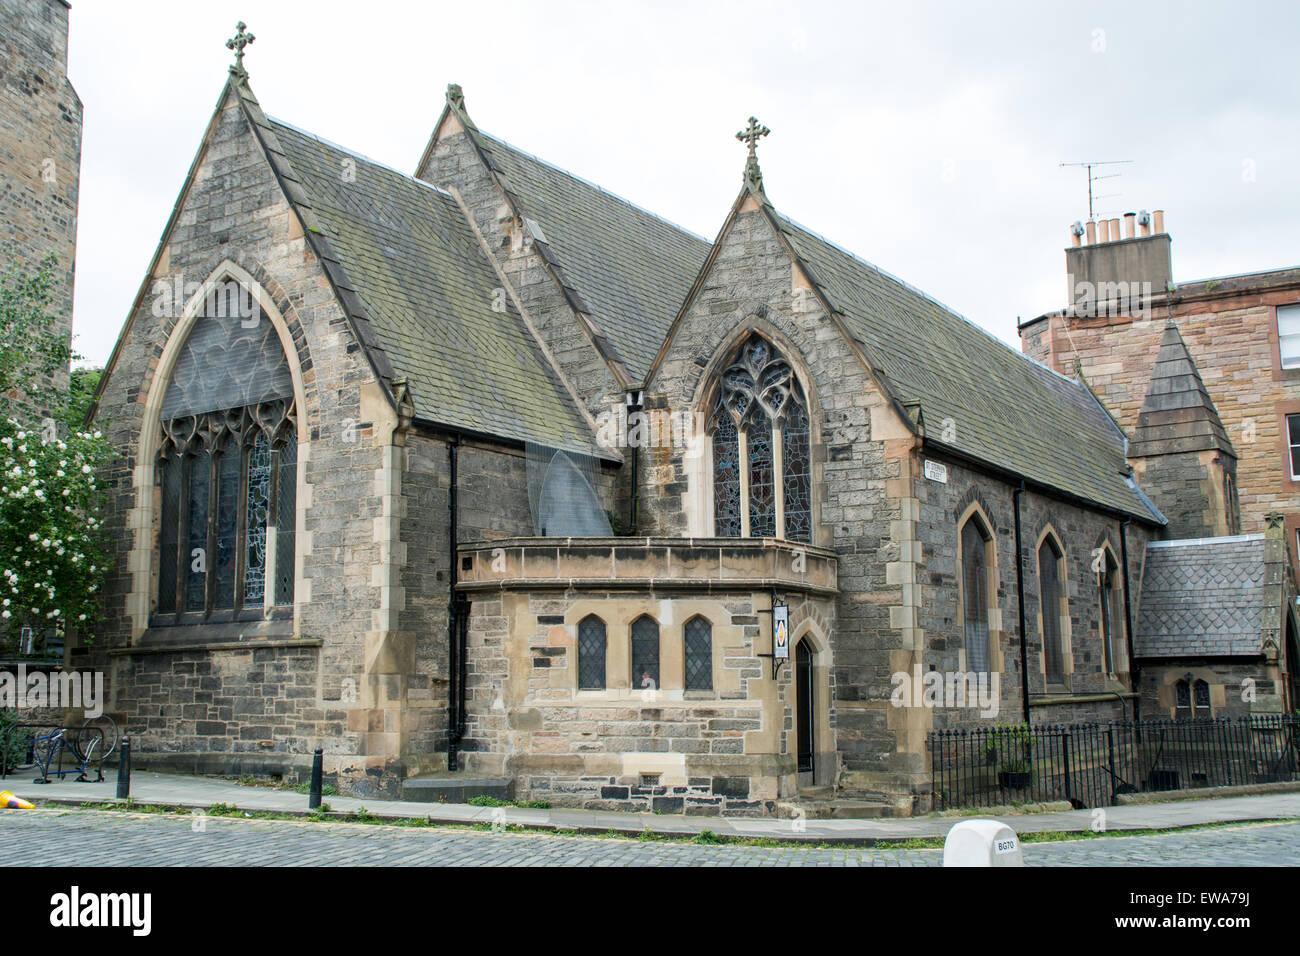 The Scottish Episcopal church building along Saint Stephen's